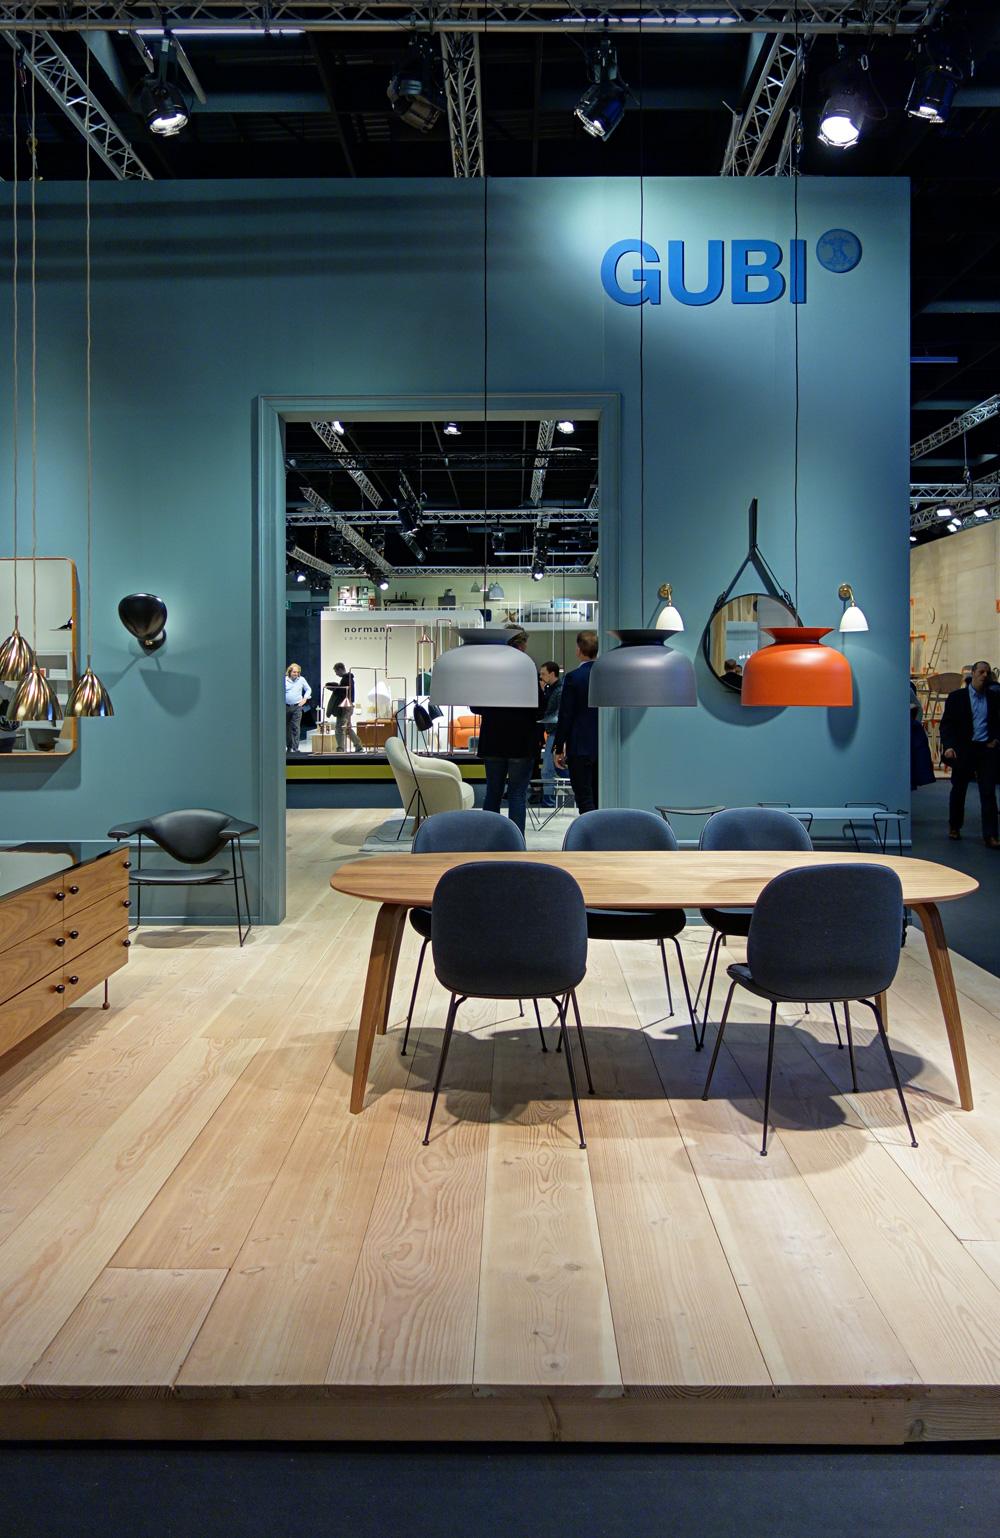 IMM-2014-Internationale-Moebelmesse-Koeln-Gubi-2